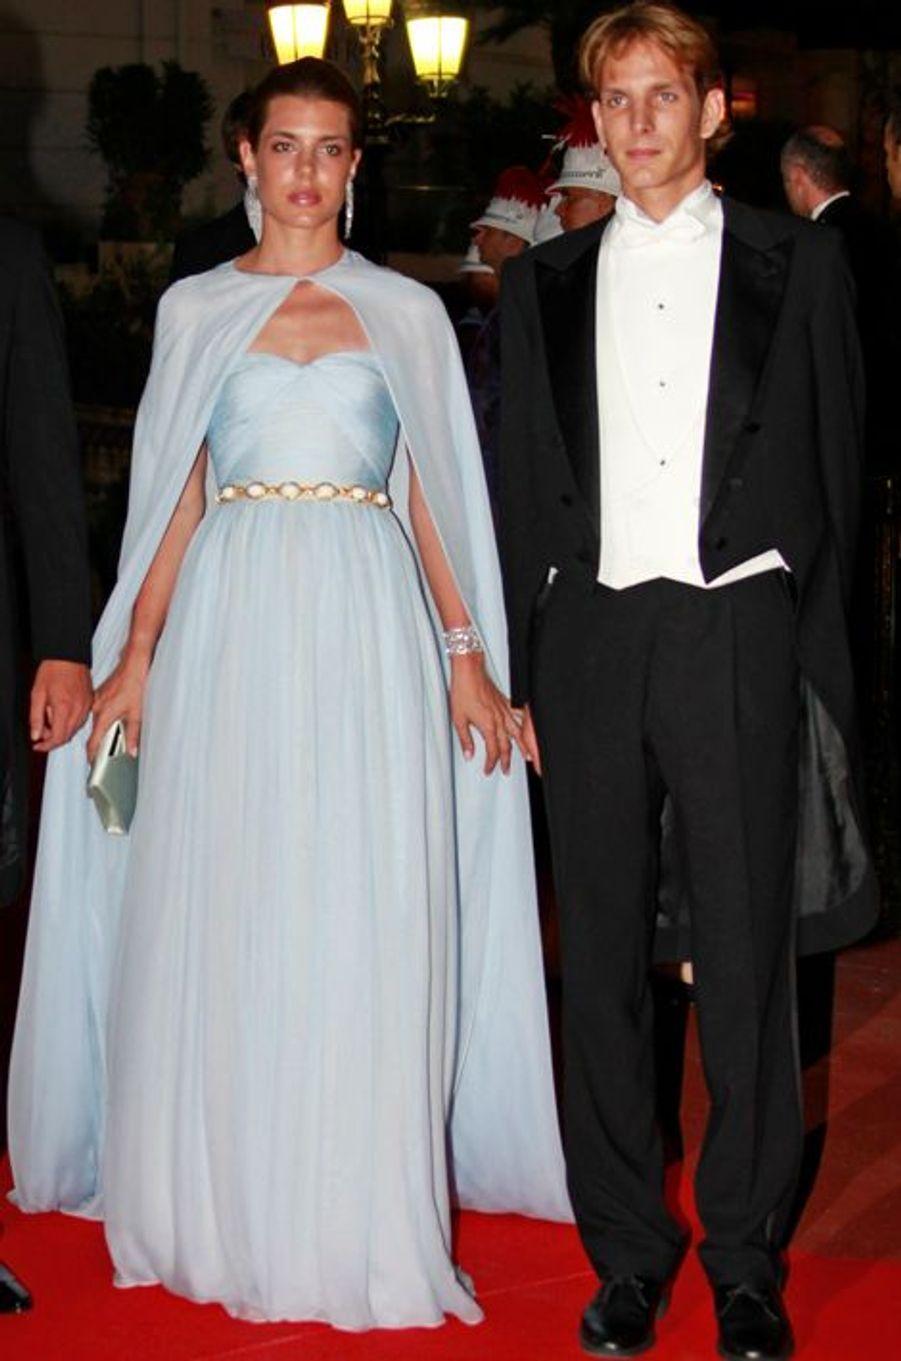 Charlotte Casiraghi avec Andrea Casiraghi, le 2 juillet 2011